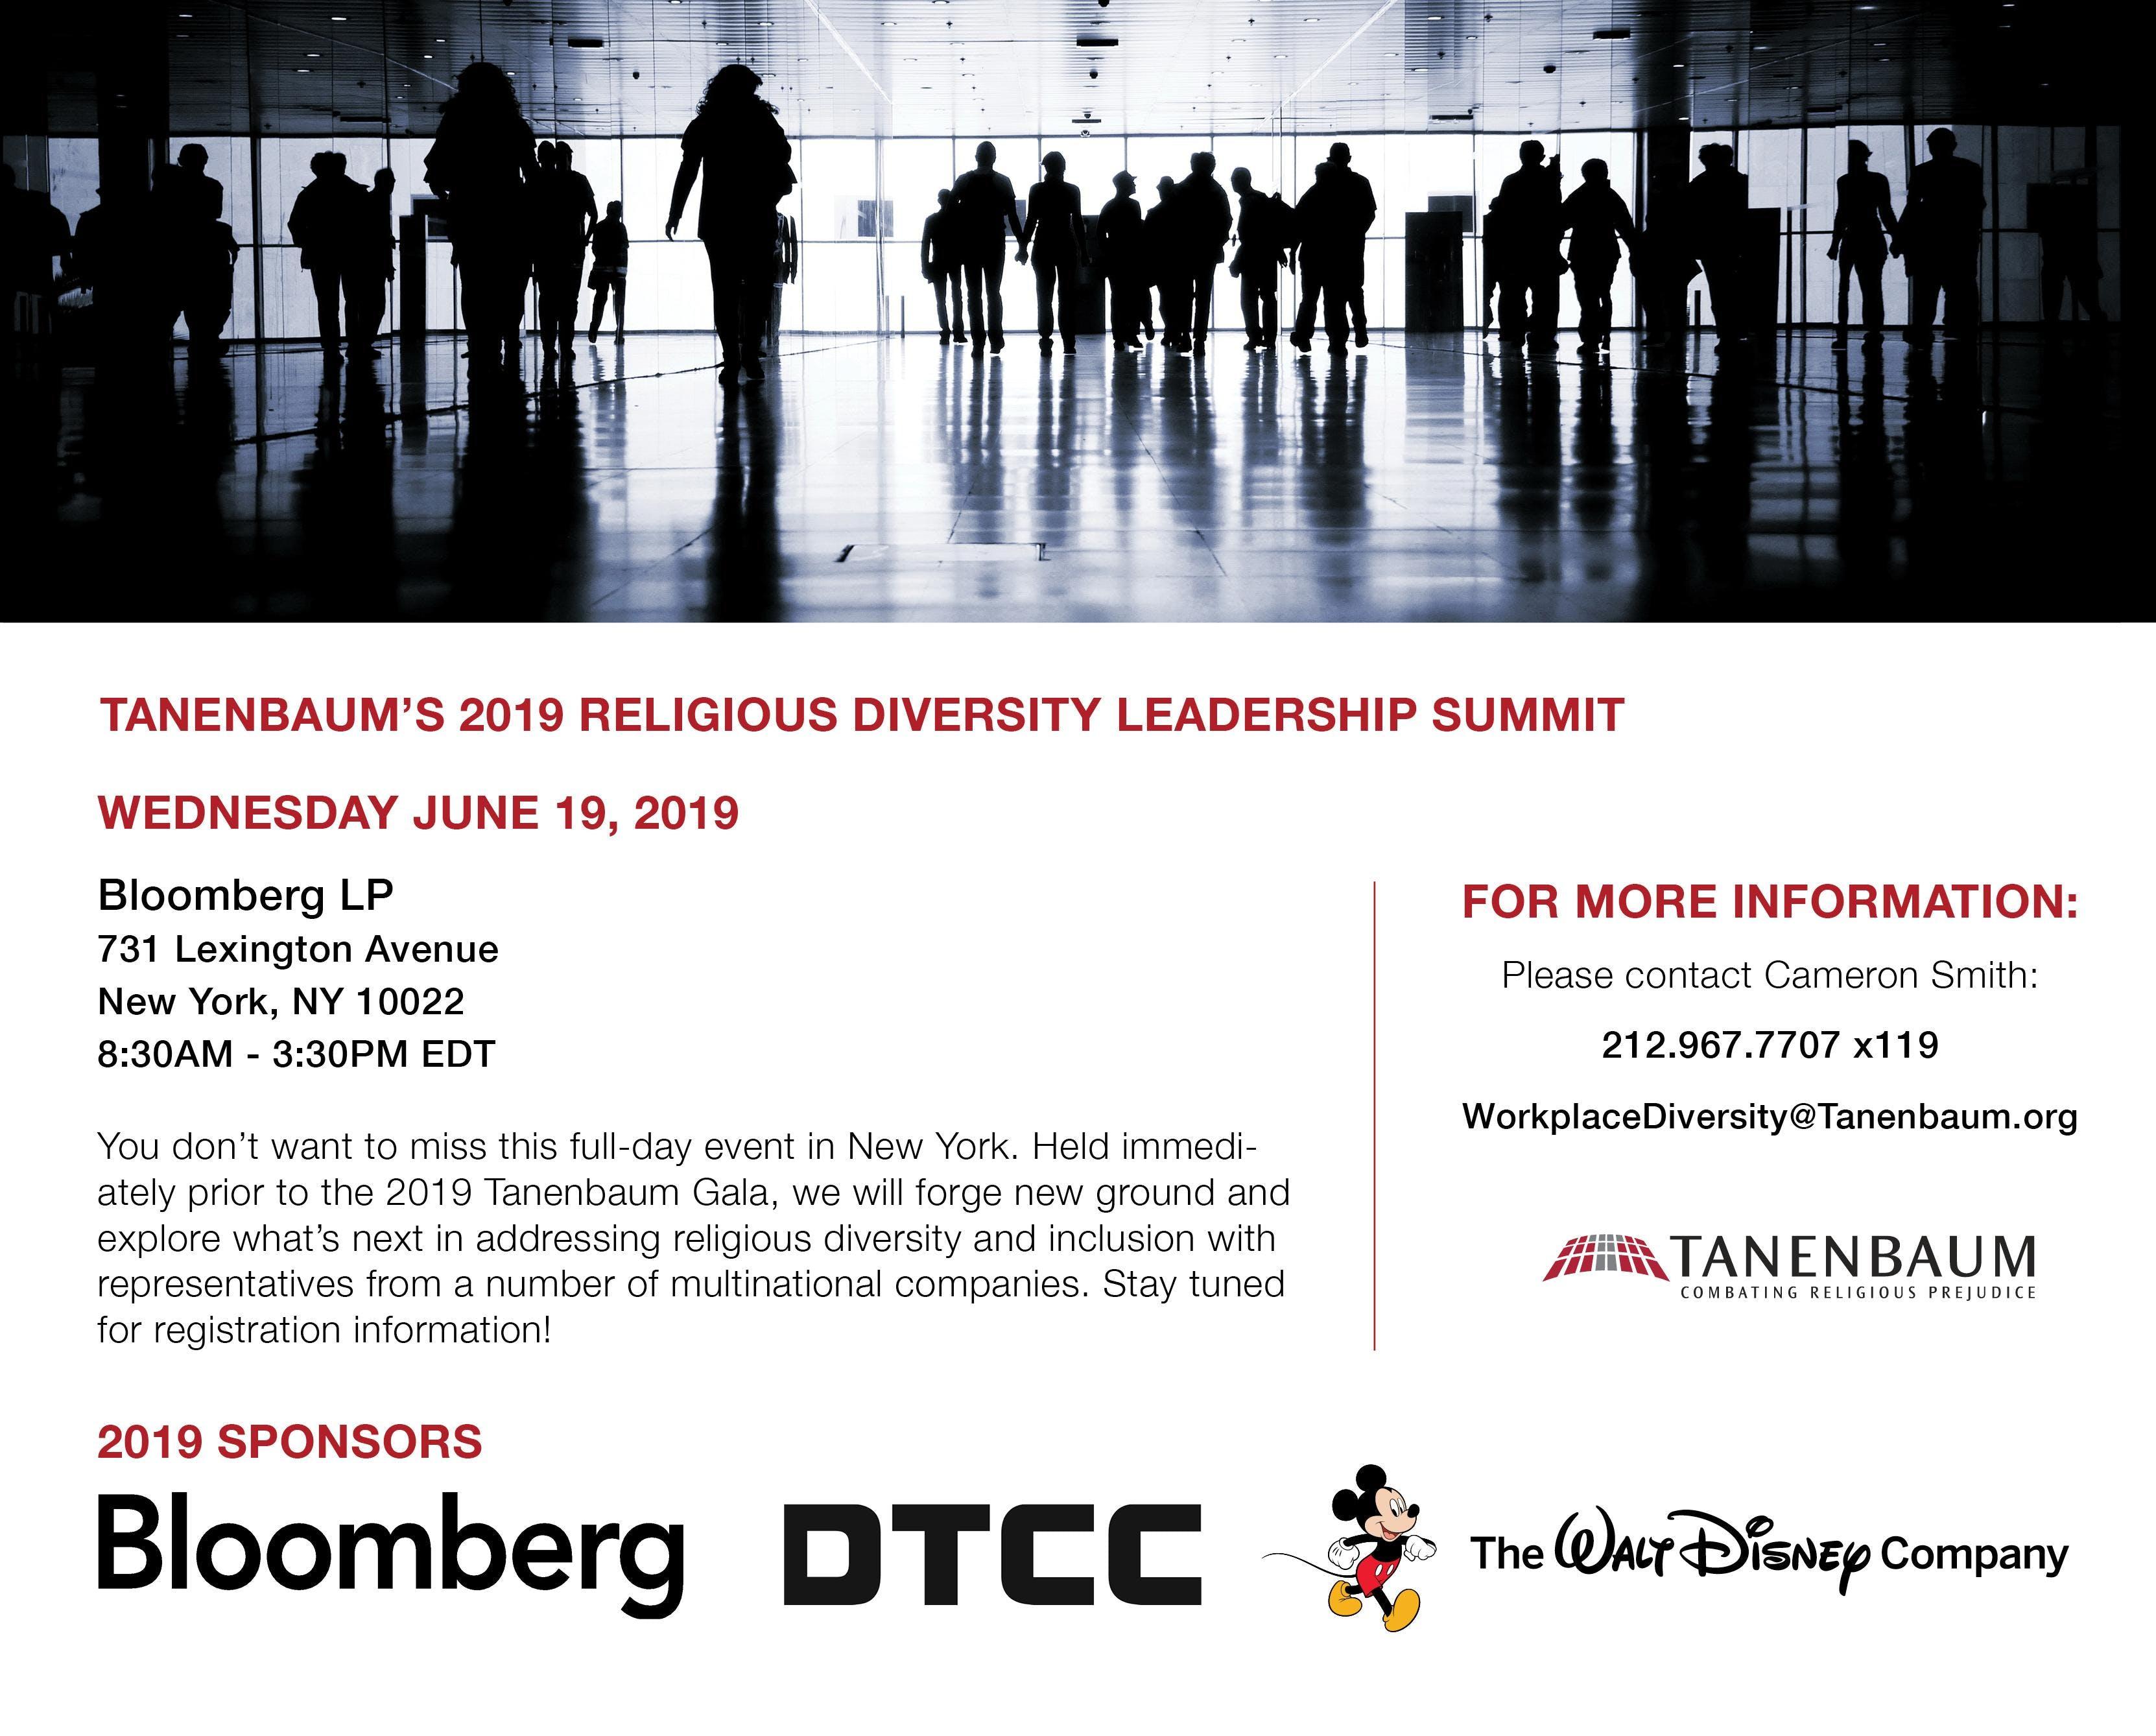 Tanenbaum's 2019 Religious Diversity Leadership Summit